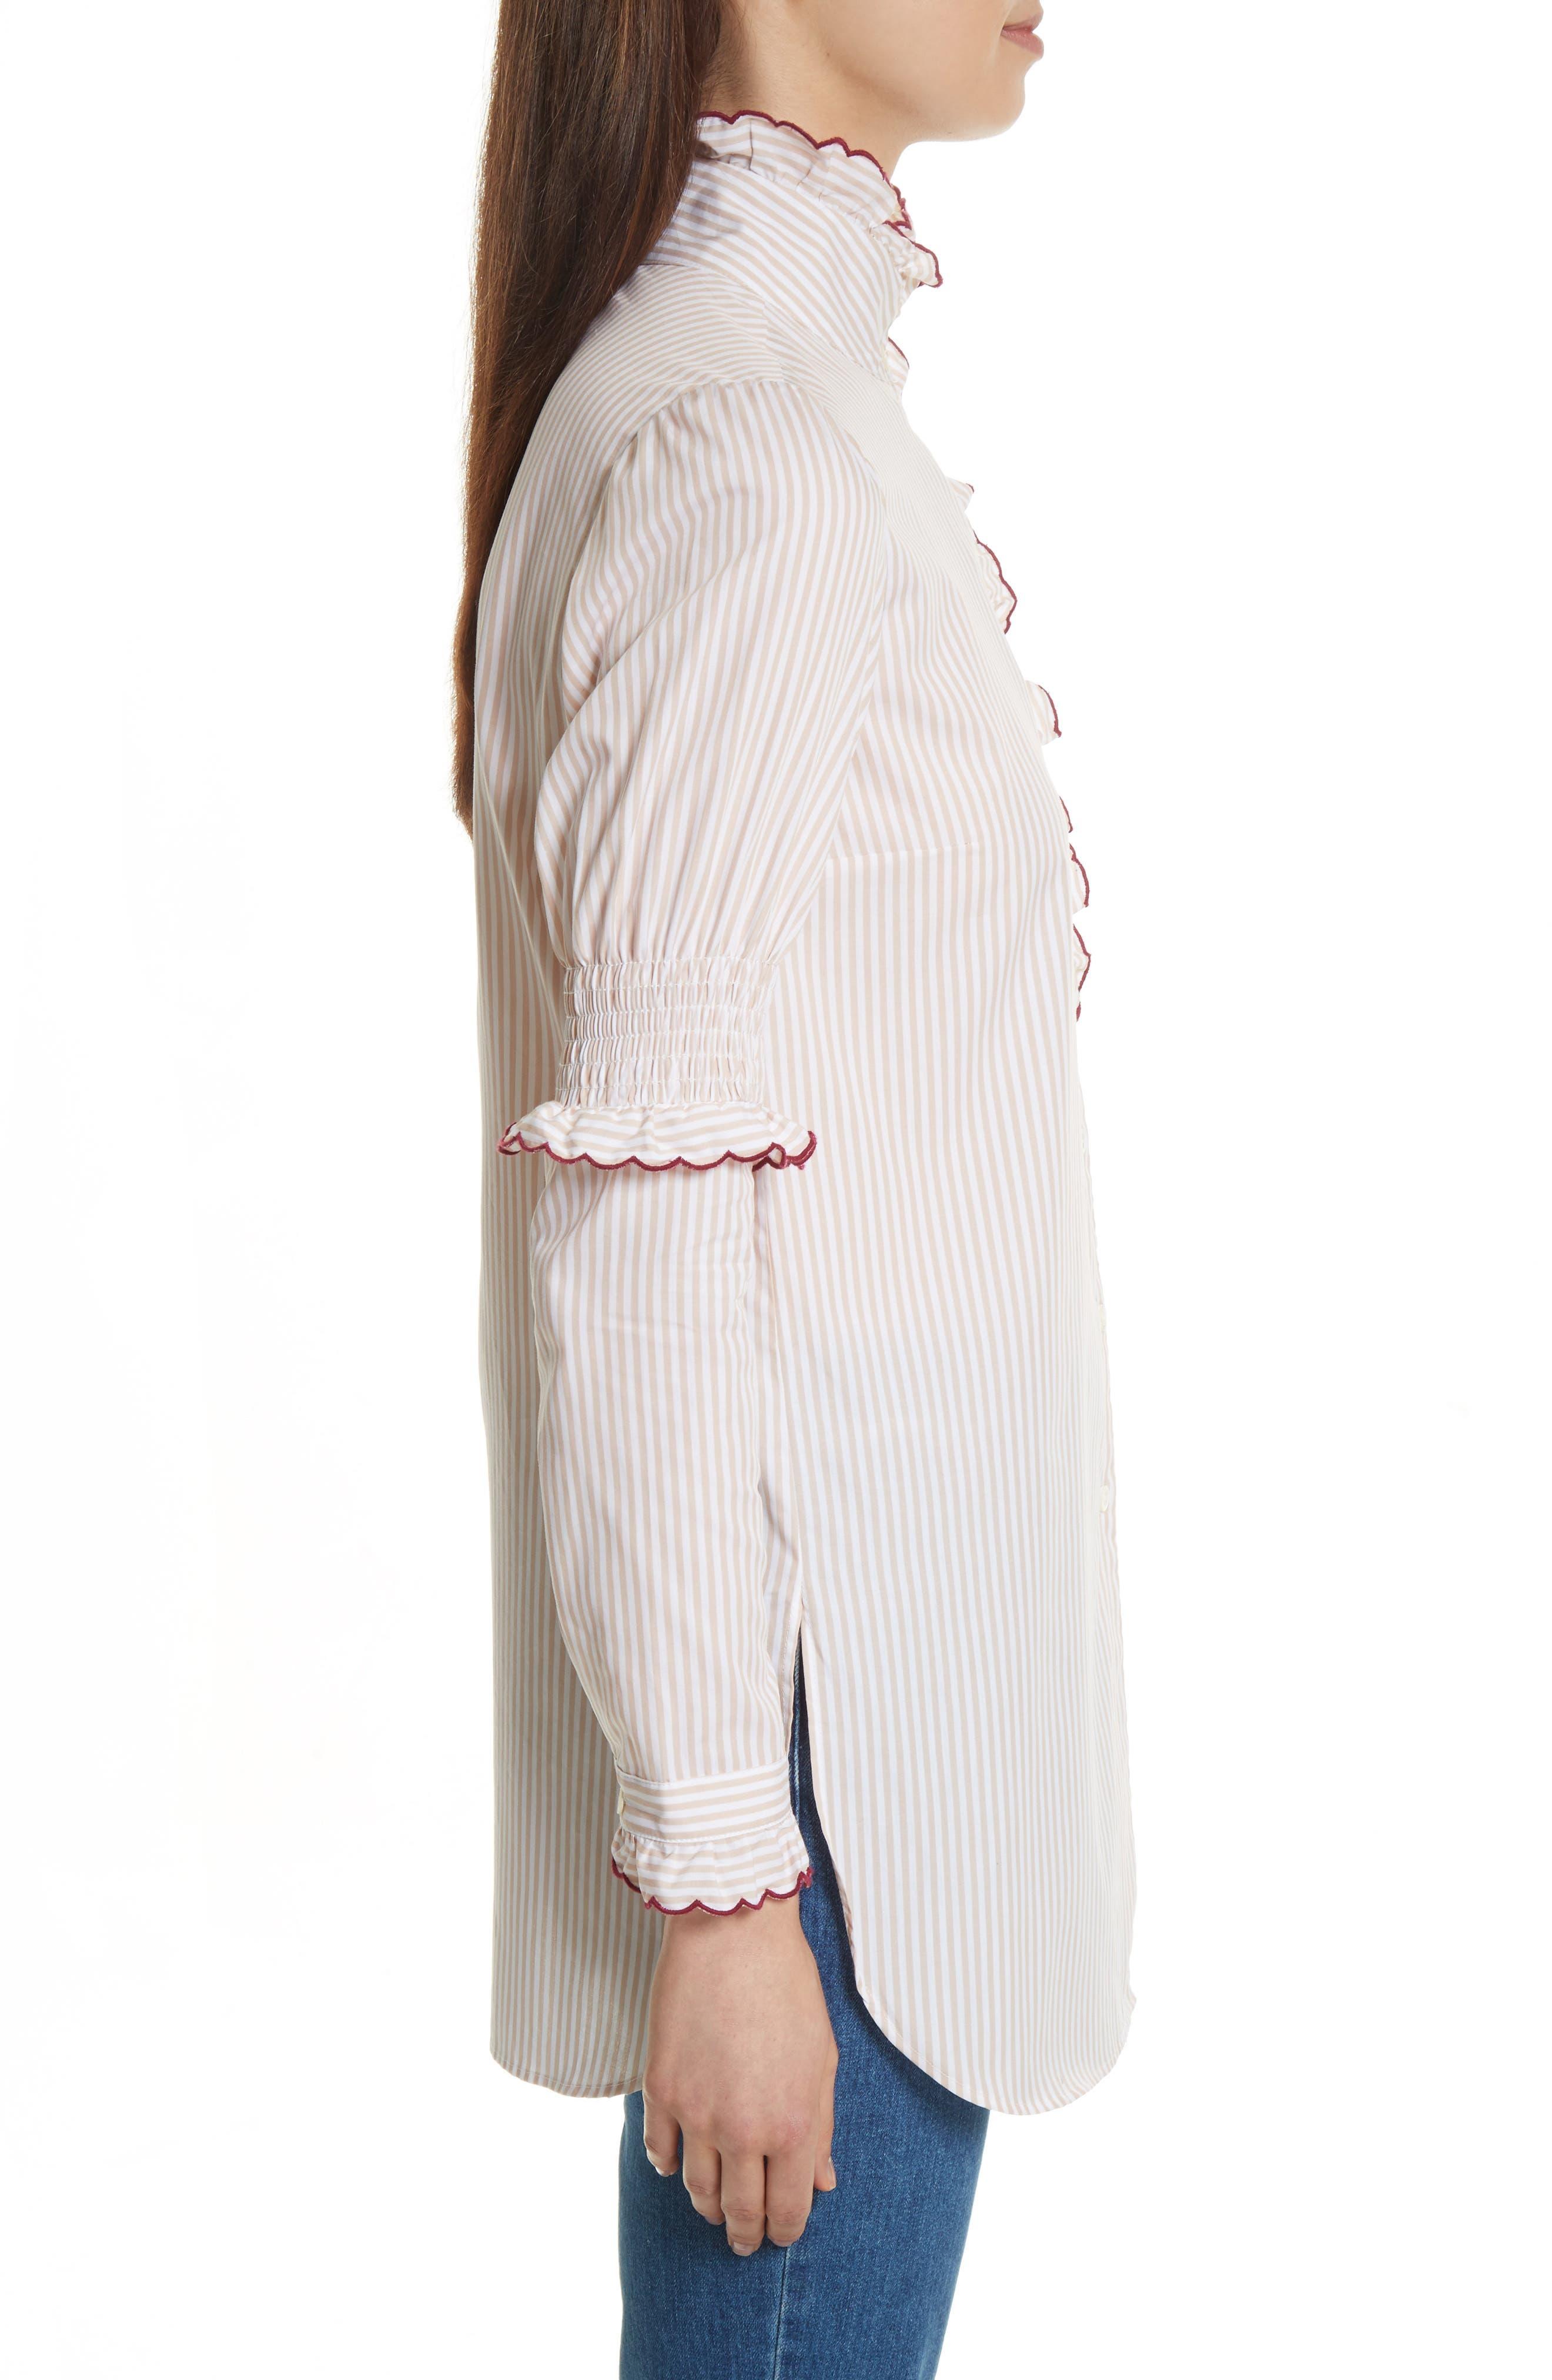 Stripe Cotton Shirt,                             Alternate thumbnail 3, color,                             Beige-White